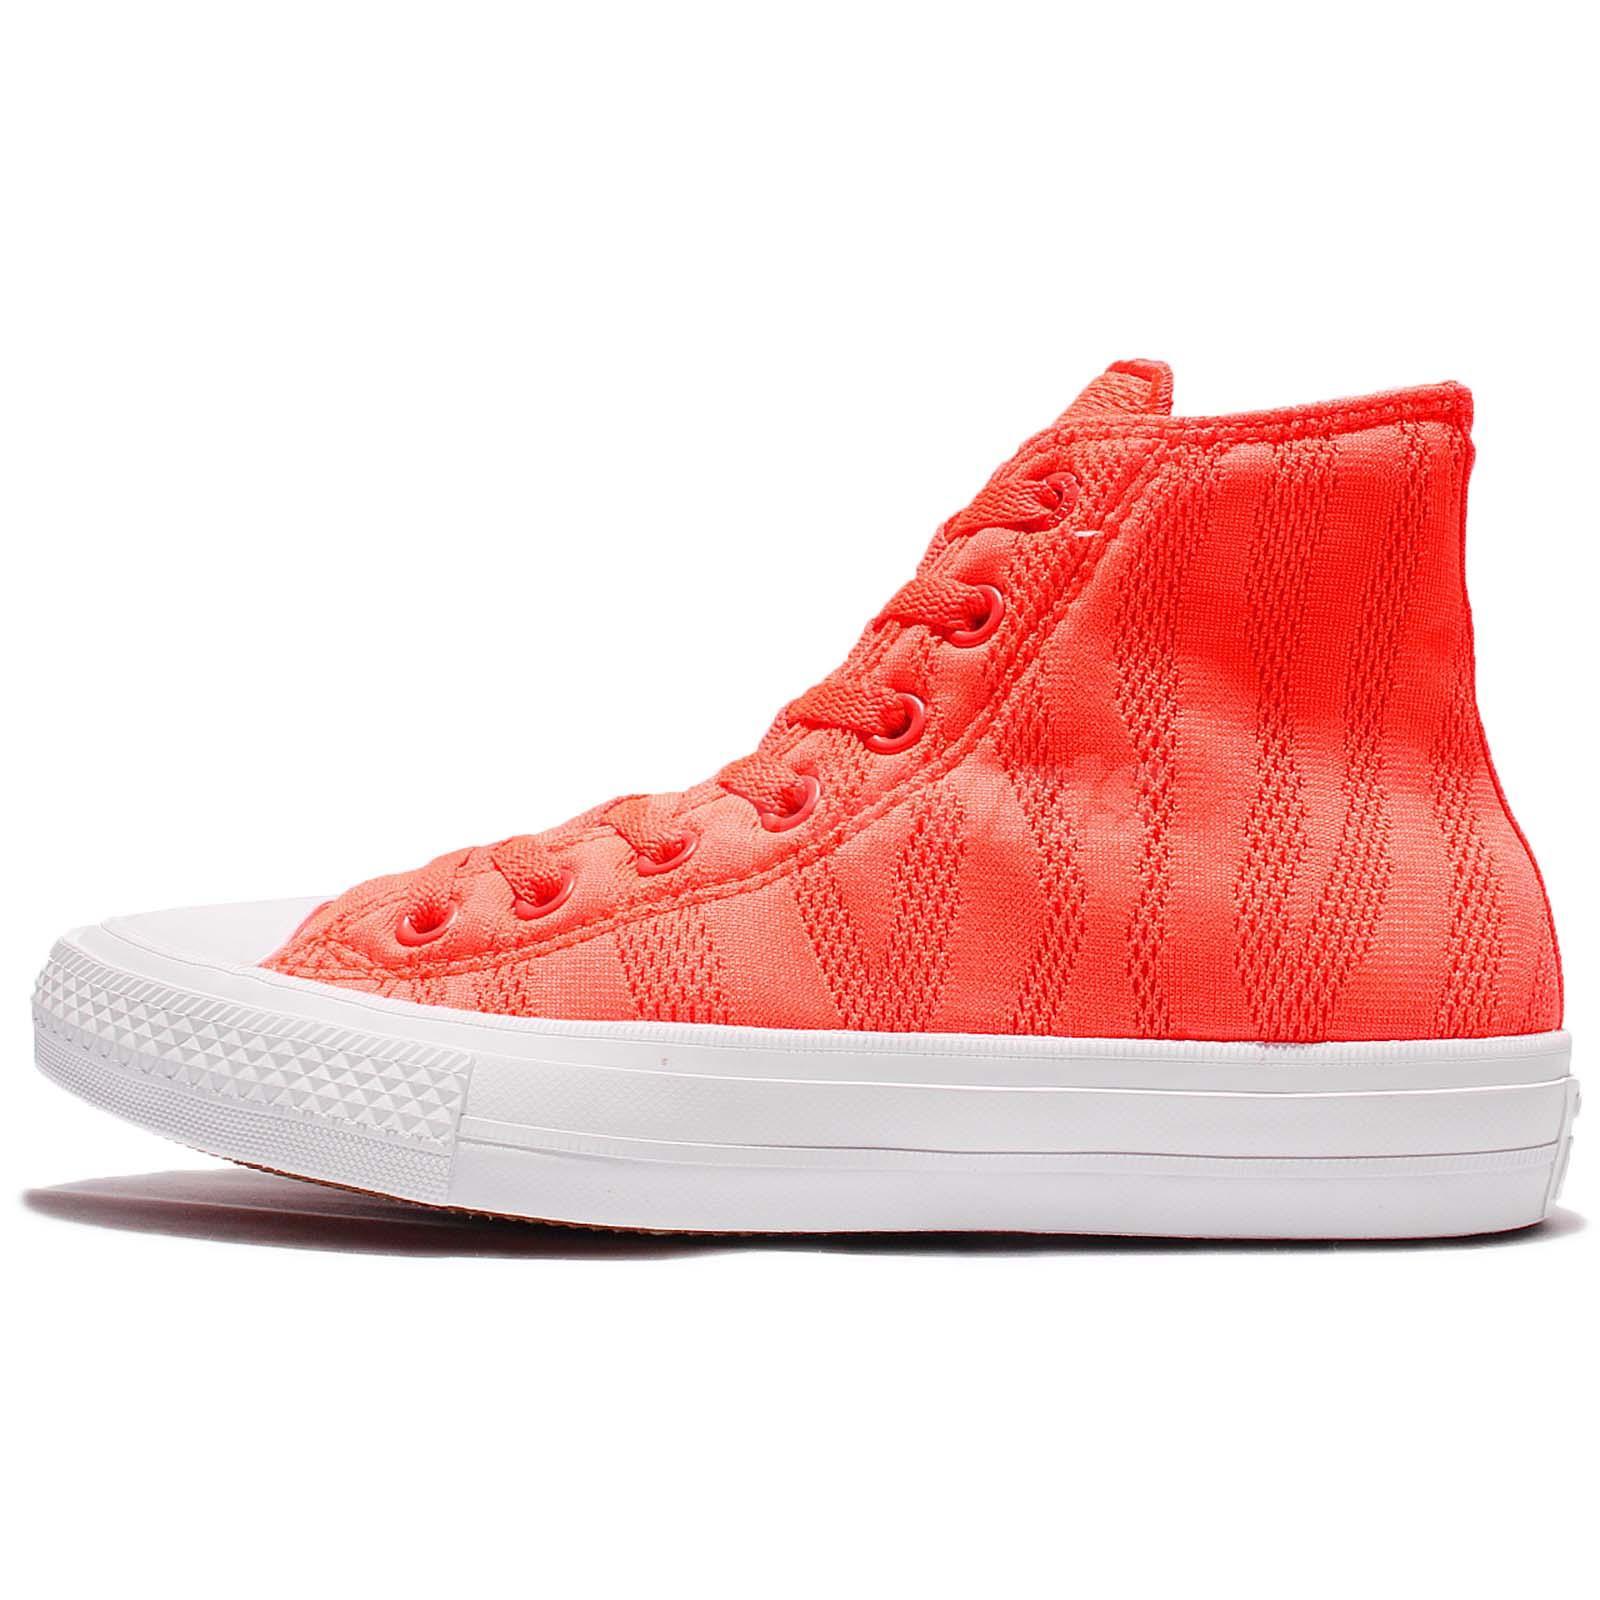 Converse Chuck Taylor All Star II Hi Top Orange White Lunarlon Men Shoes  155492C bfec4cc22